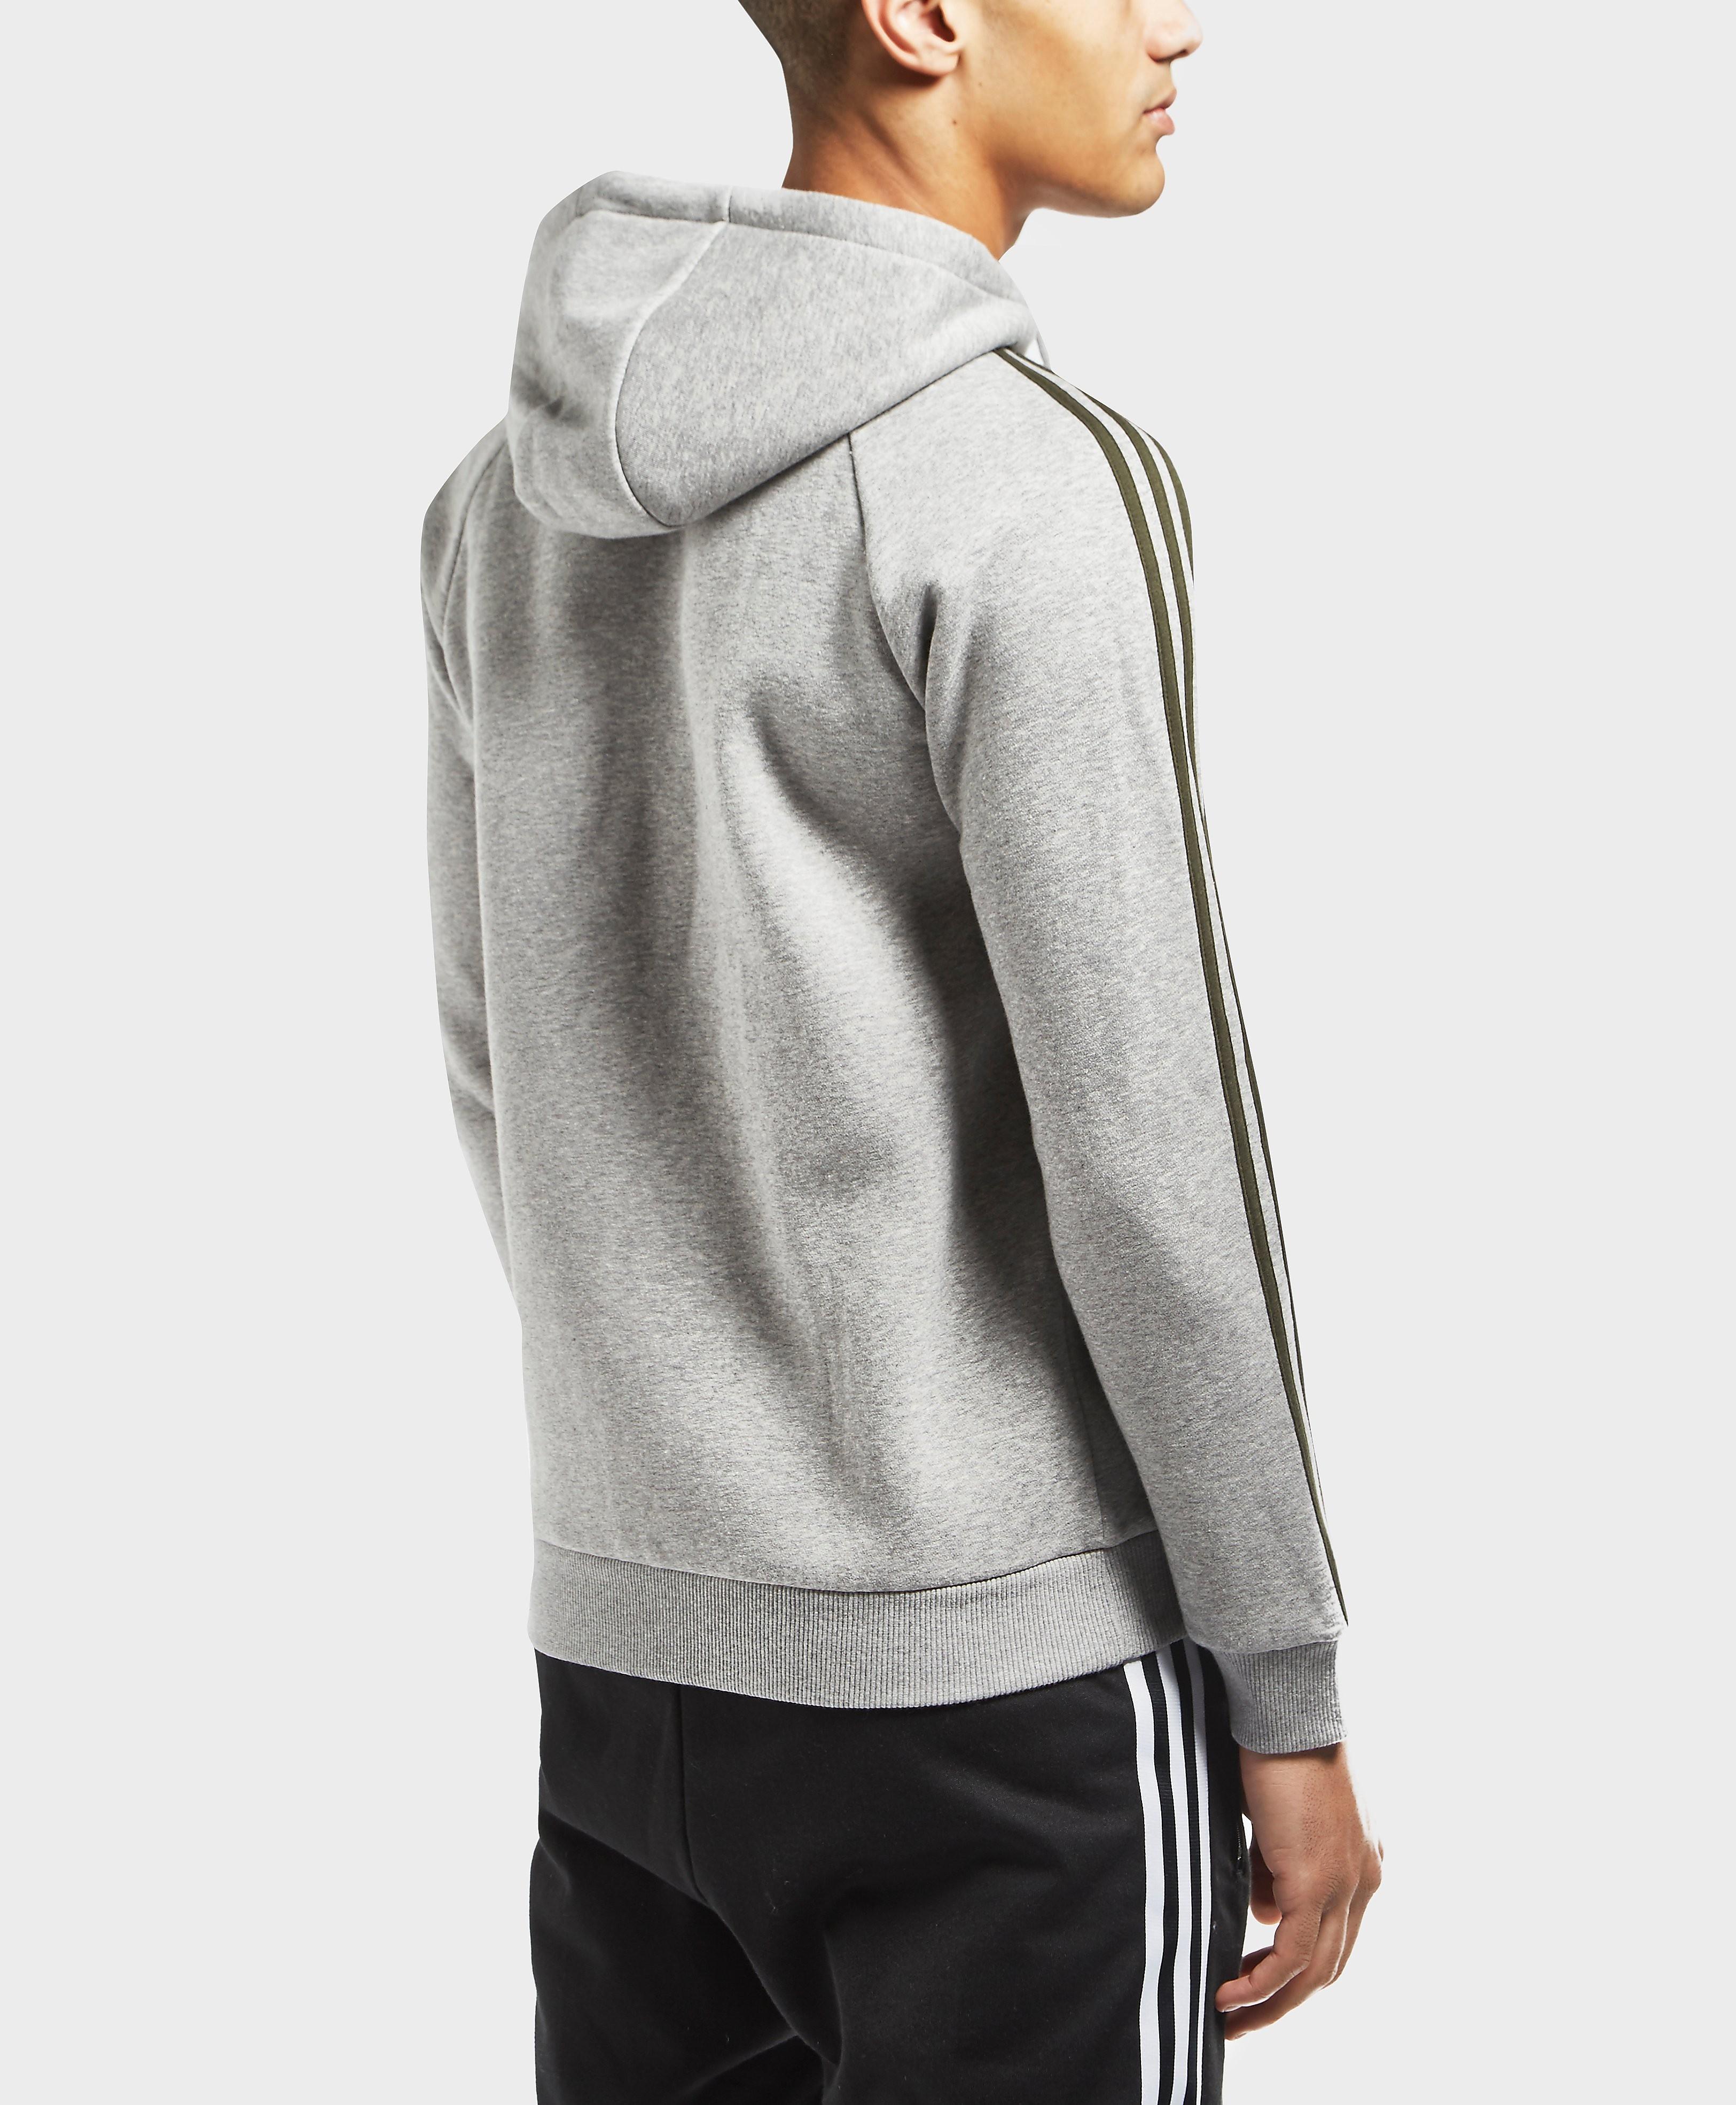 adidas Originals California Full Zip Hoodie